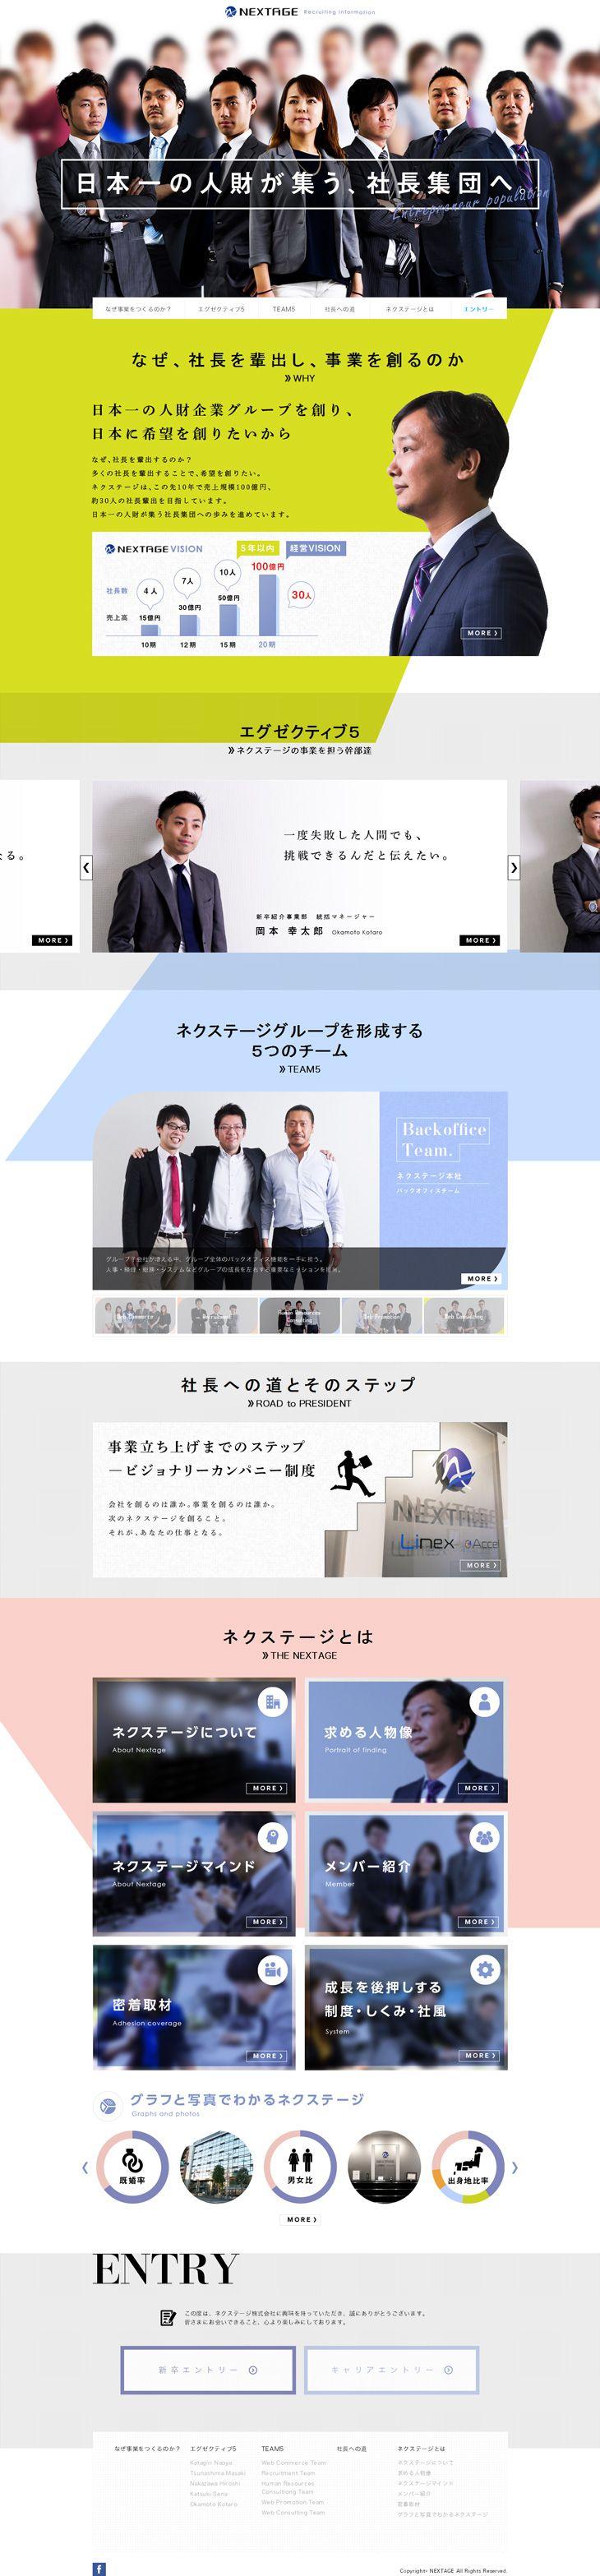 NEXTAGE リクルートサイト【求人関連関連】のLPデザイン。WEBデザイナーさん必見!ランディングページのデザイン参考に(シンプル系)